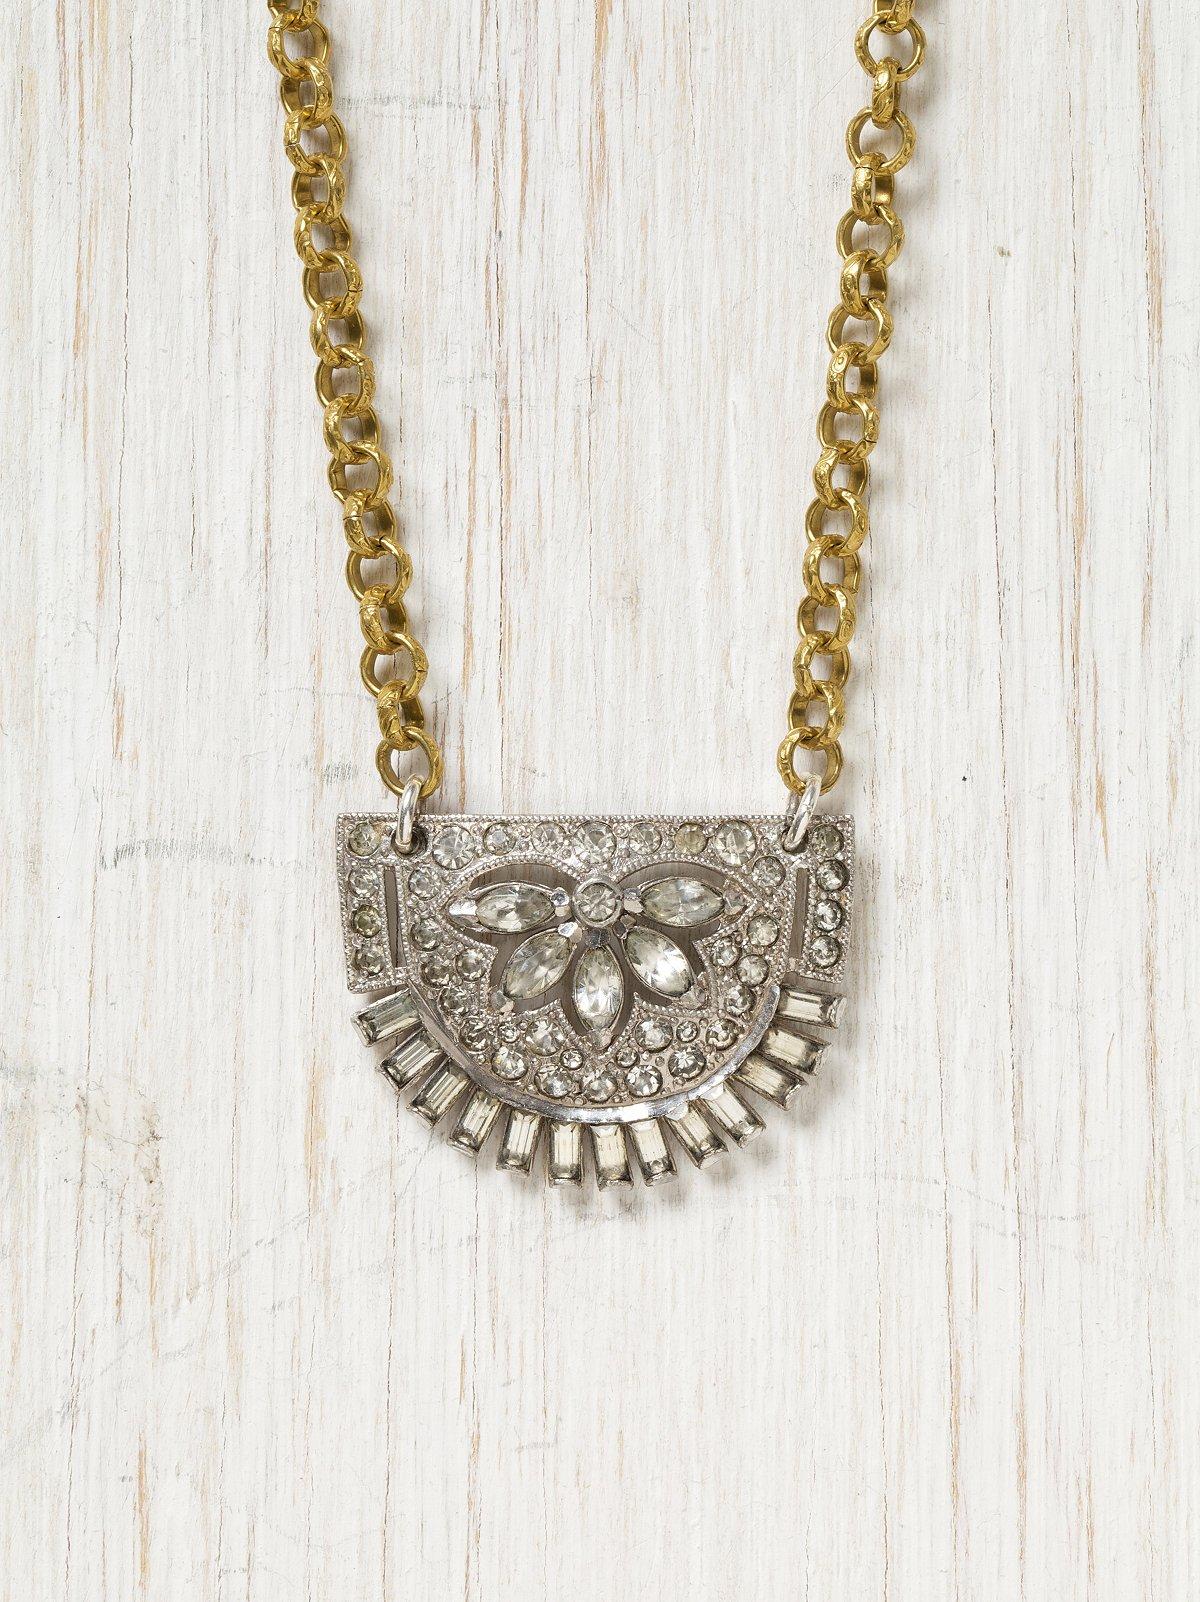 Vintage Moon Rhinestone Necklace